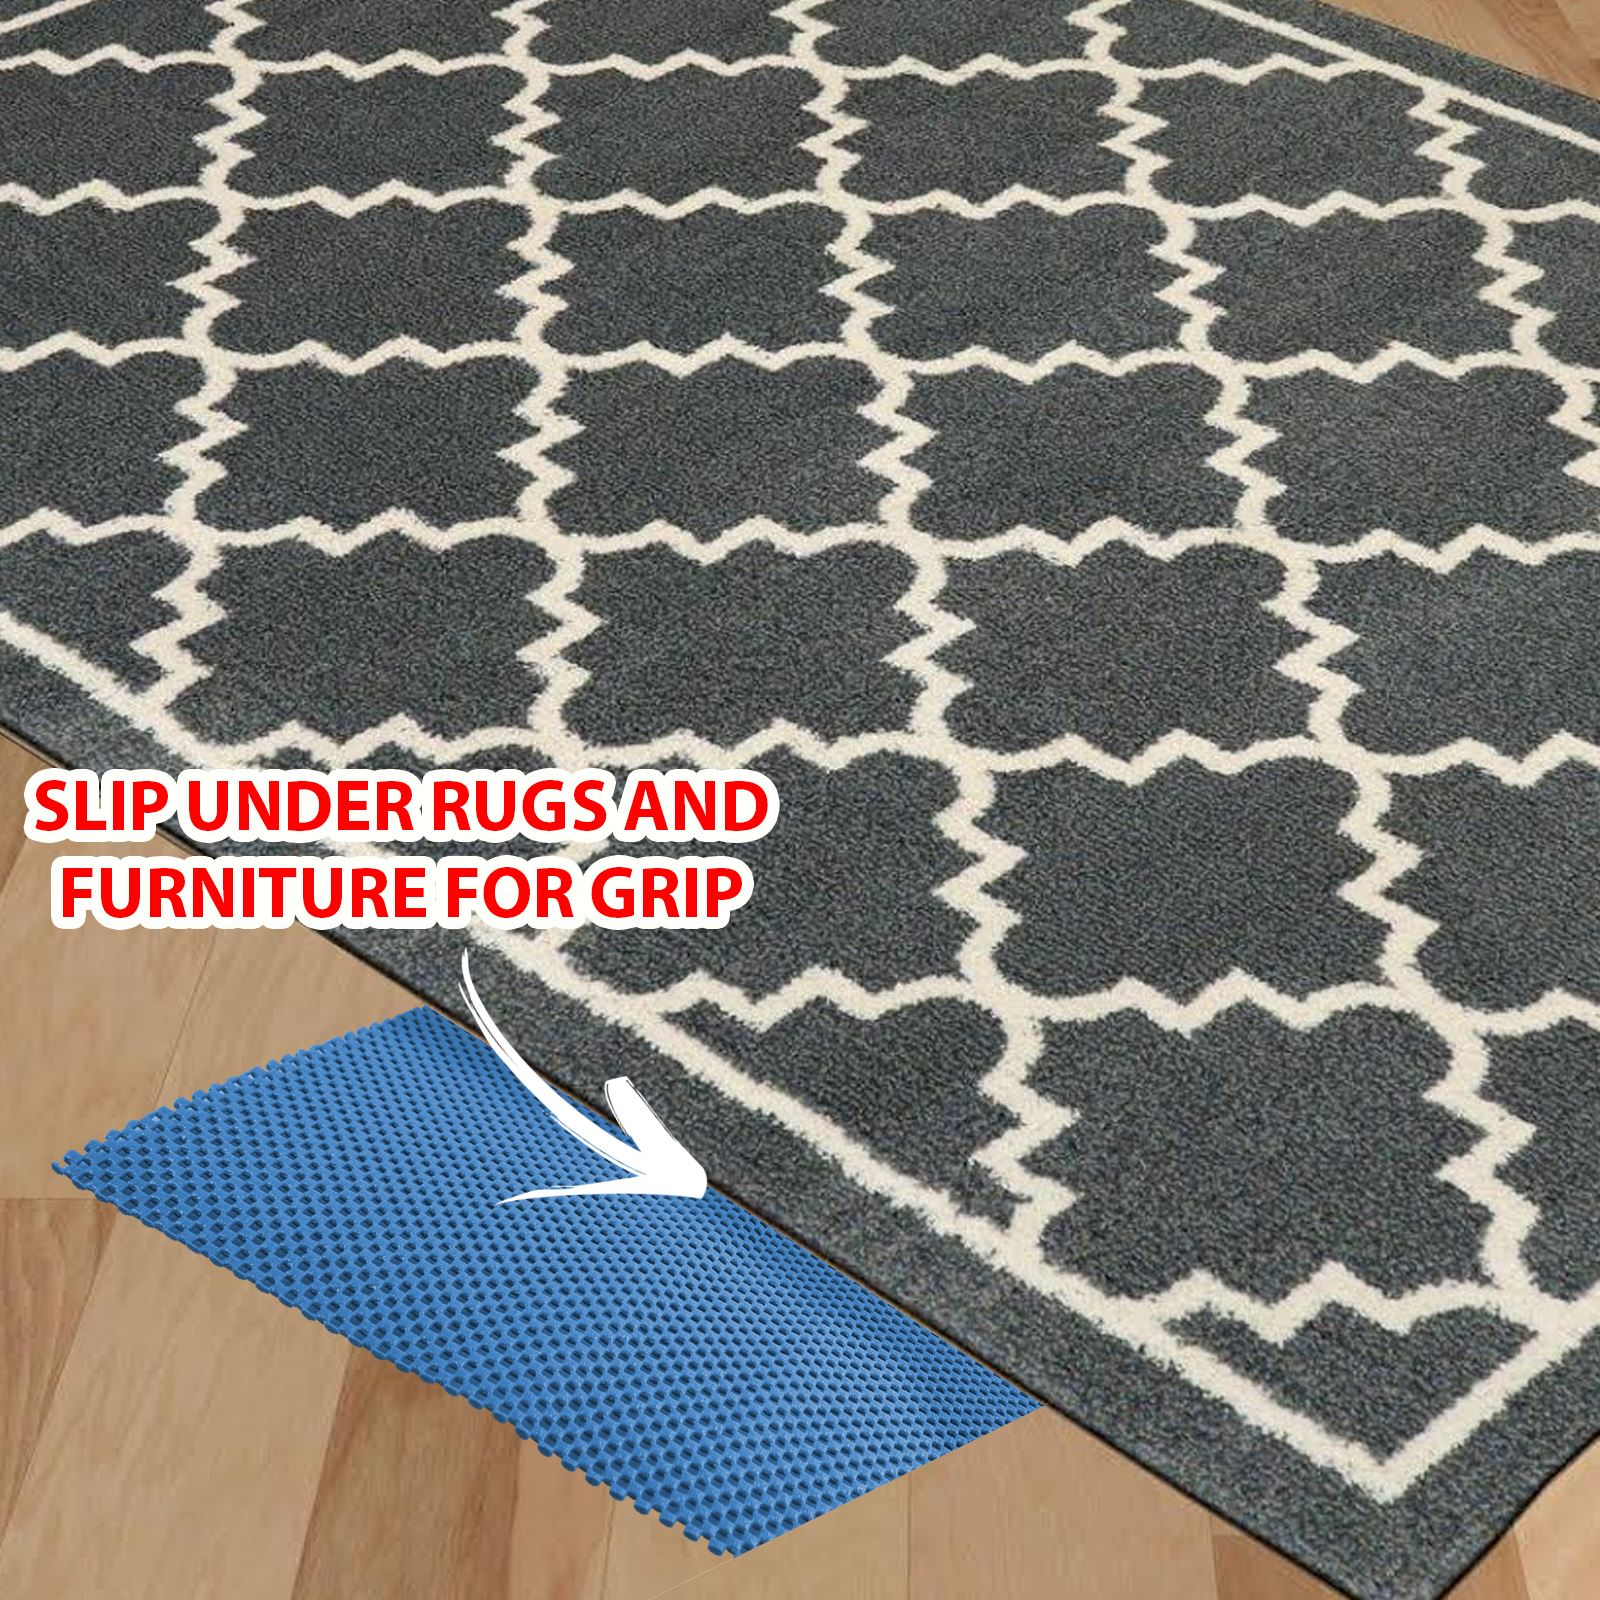 Multi-Purpose-Anti-Non-Slip-Rubber-Mat-Drawer-Liner-Flooring-Gripper-Carpet-Rug thumbnail 5